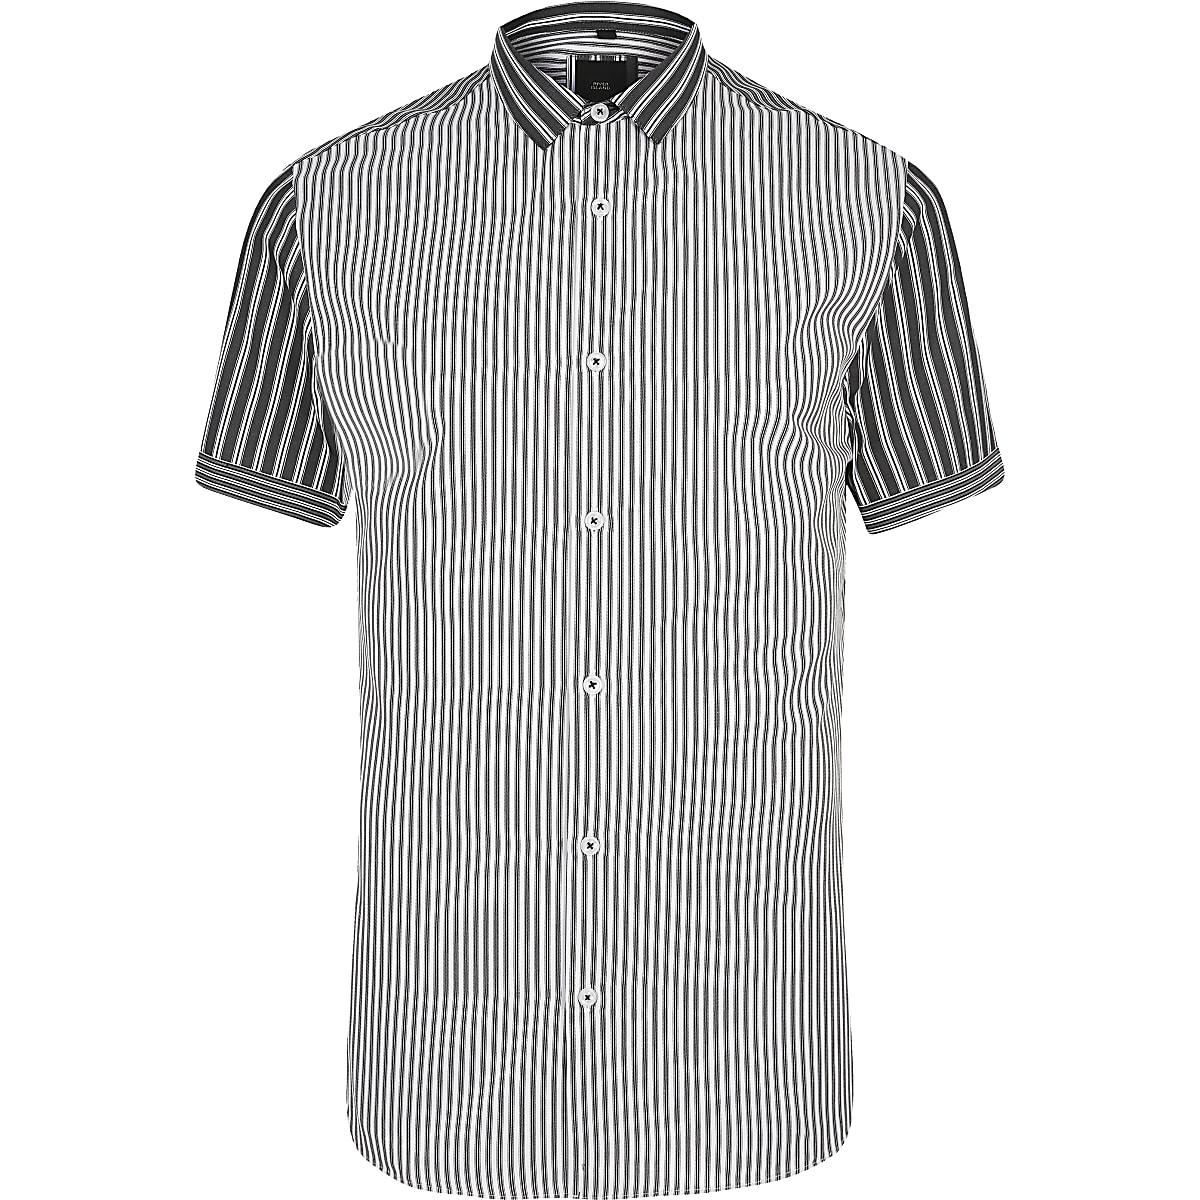 Donkergrijs Overhemd.Donkergrijs Gestreept Slim Fit Poplin Overhemd Overhemden Met